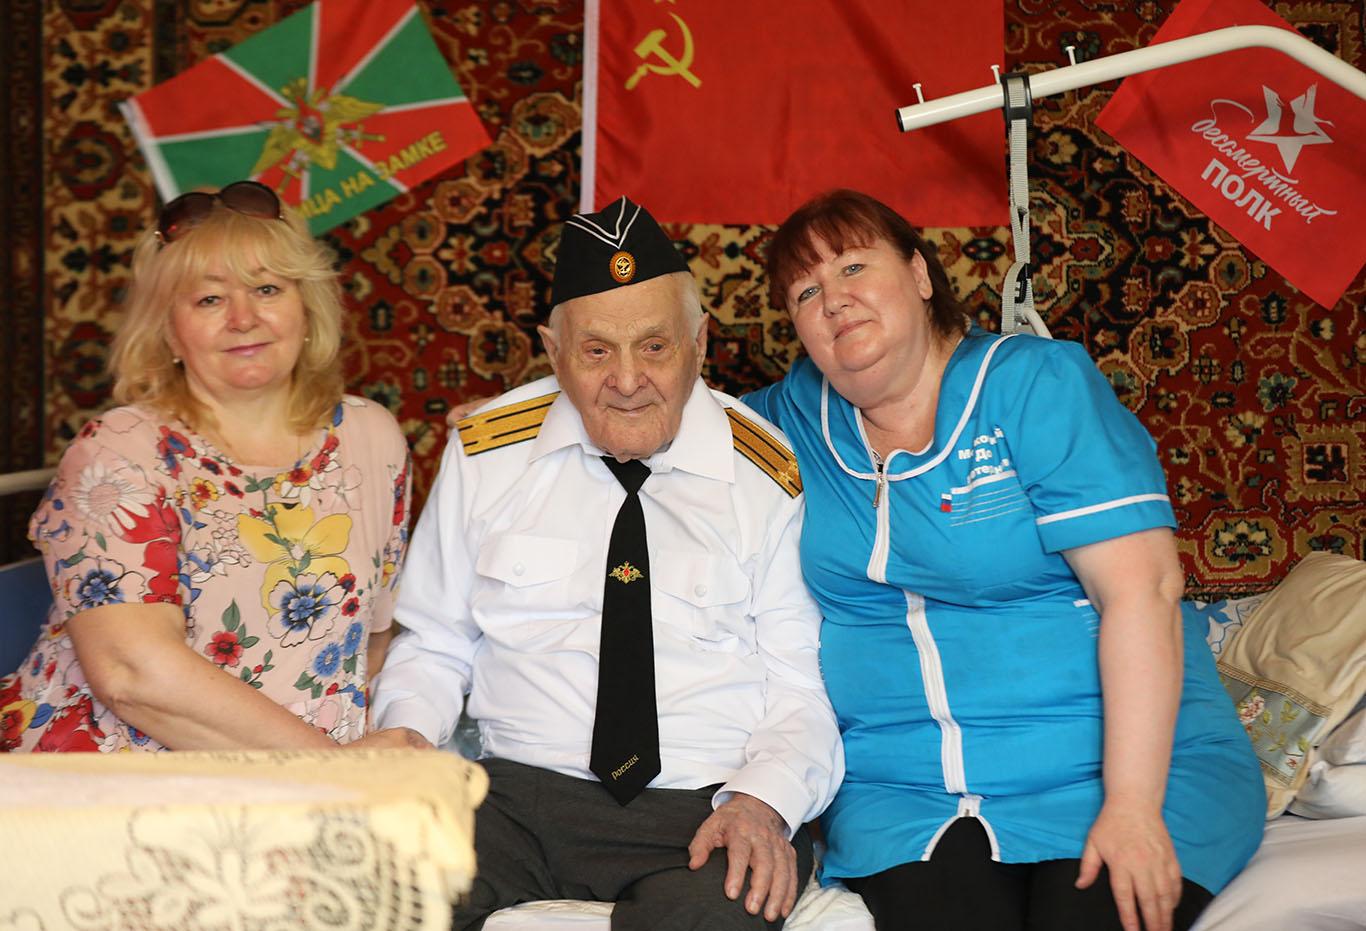 Век за плечами: сотрудники Московского Дома ветеранов поздравили с юбилеем Виктора Ивановича Алексеева